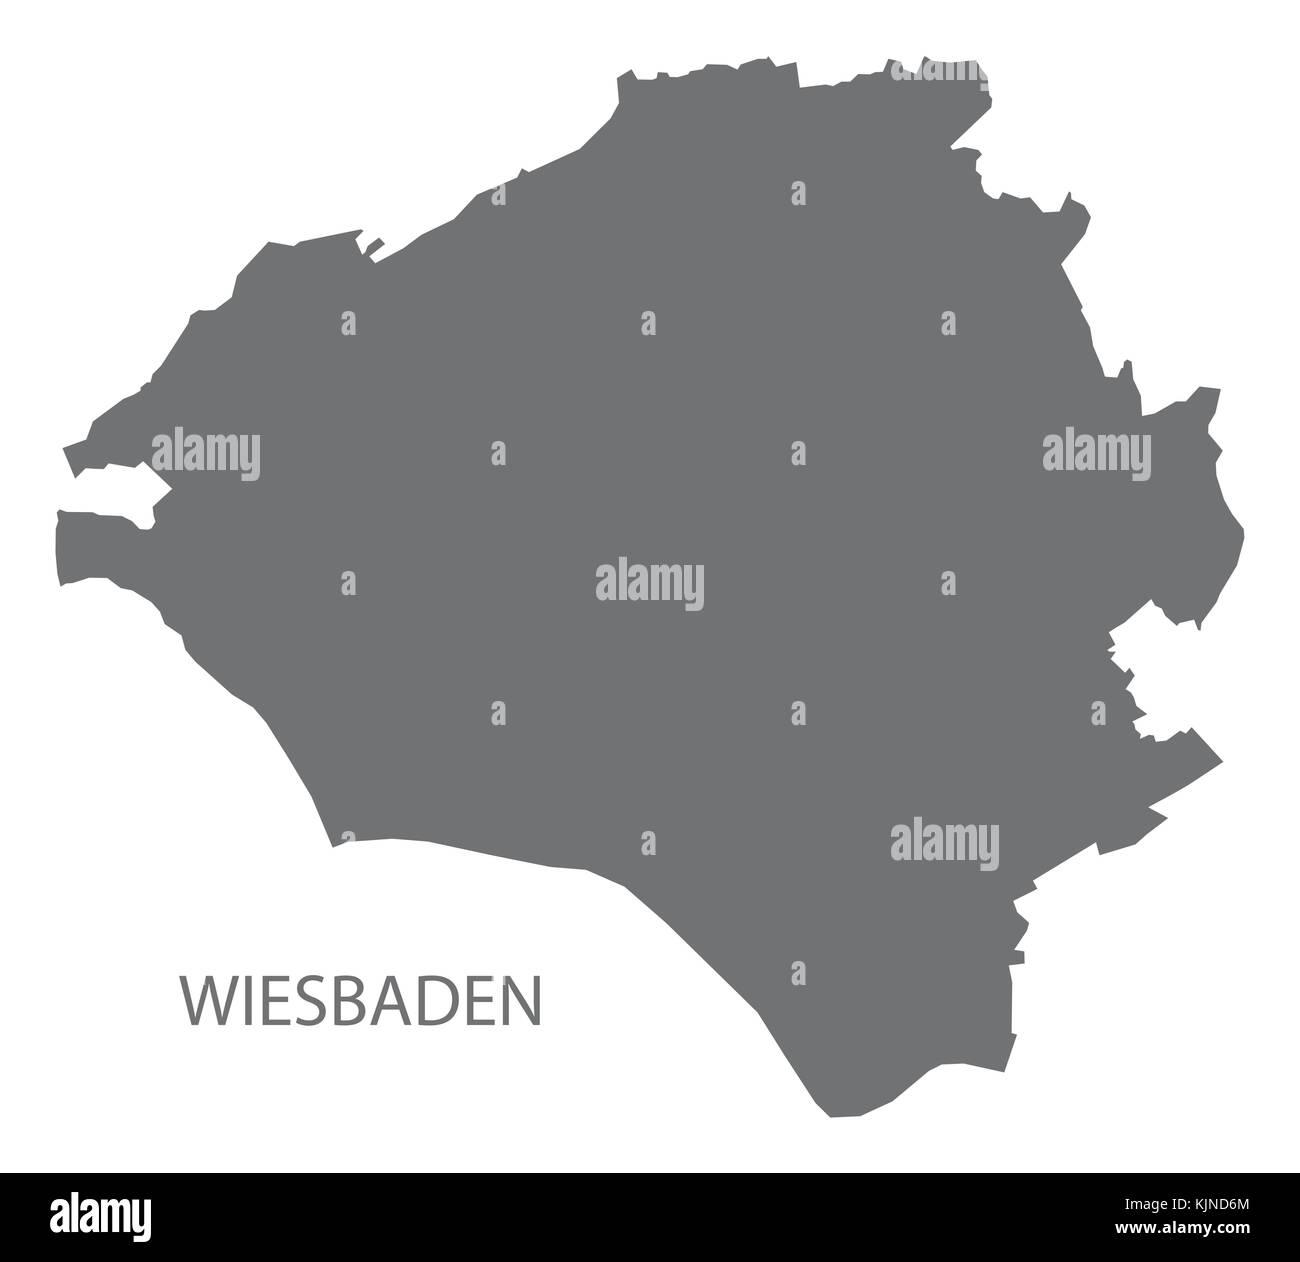 Wiesbaden city map grey illustration silhouette shape Stock Vector